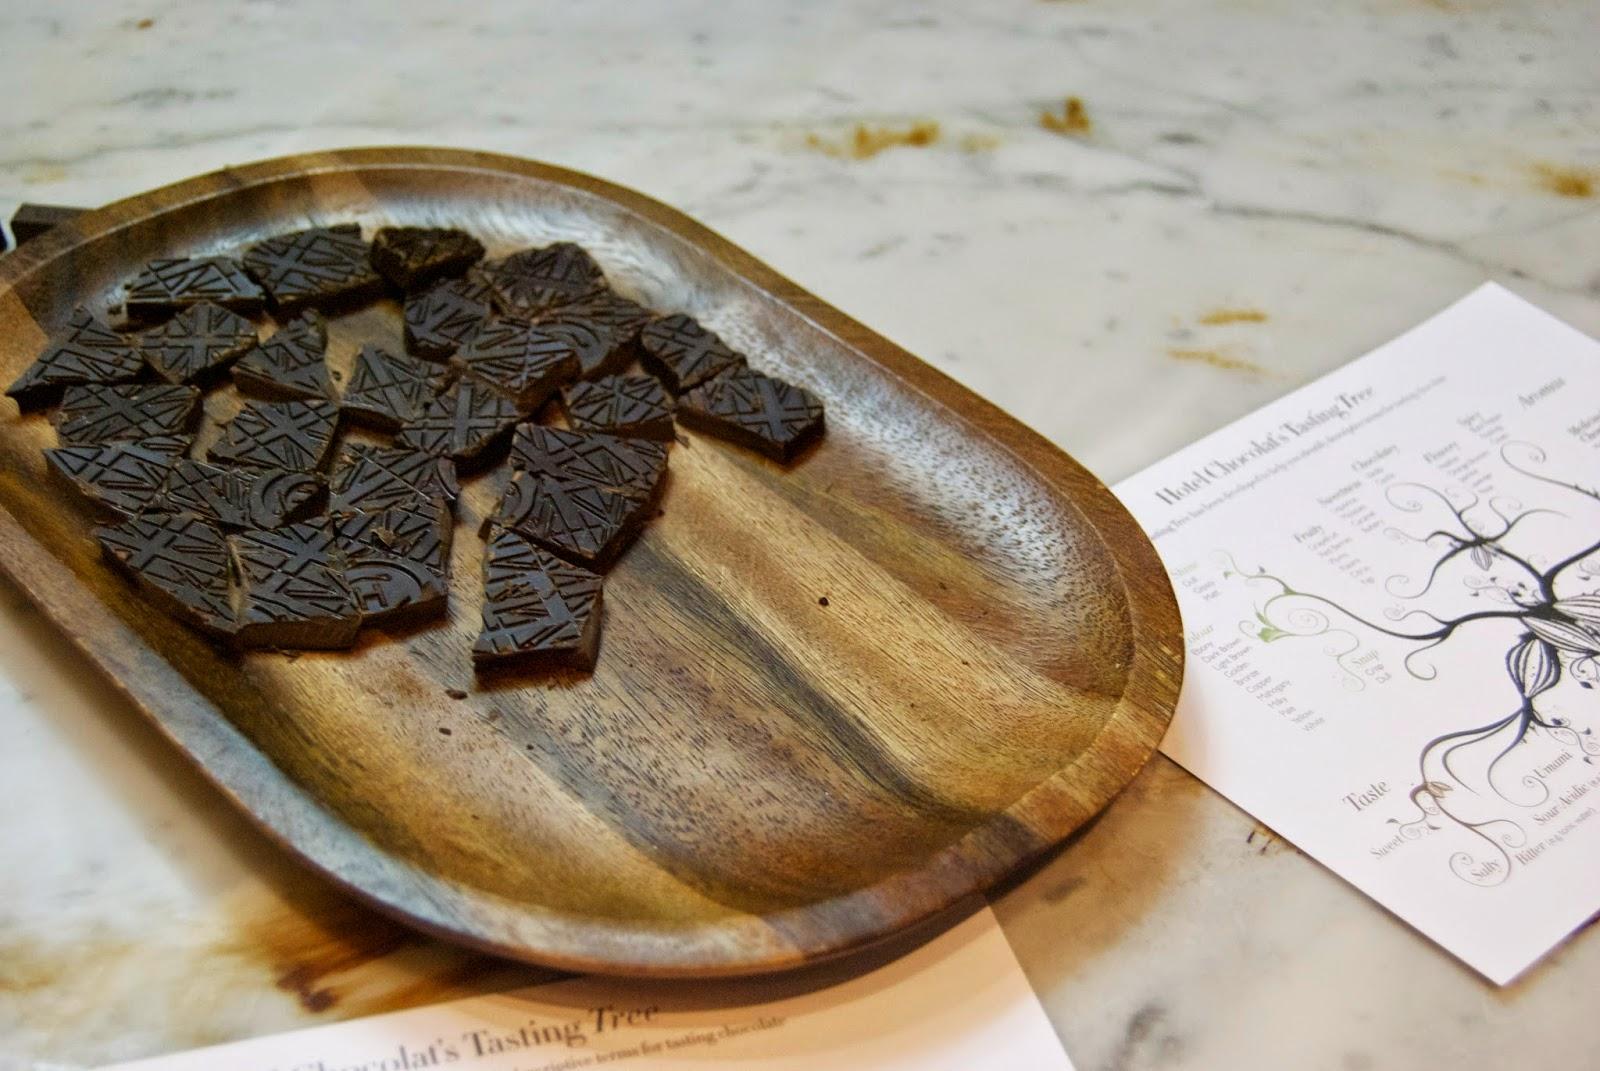 hotel chocolat roast + conch leeds review